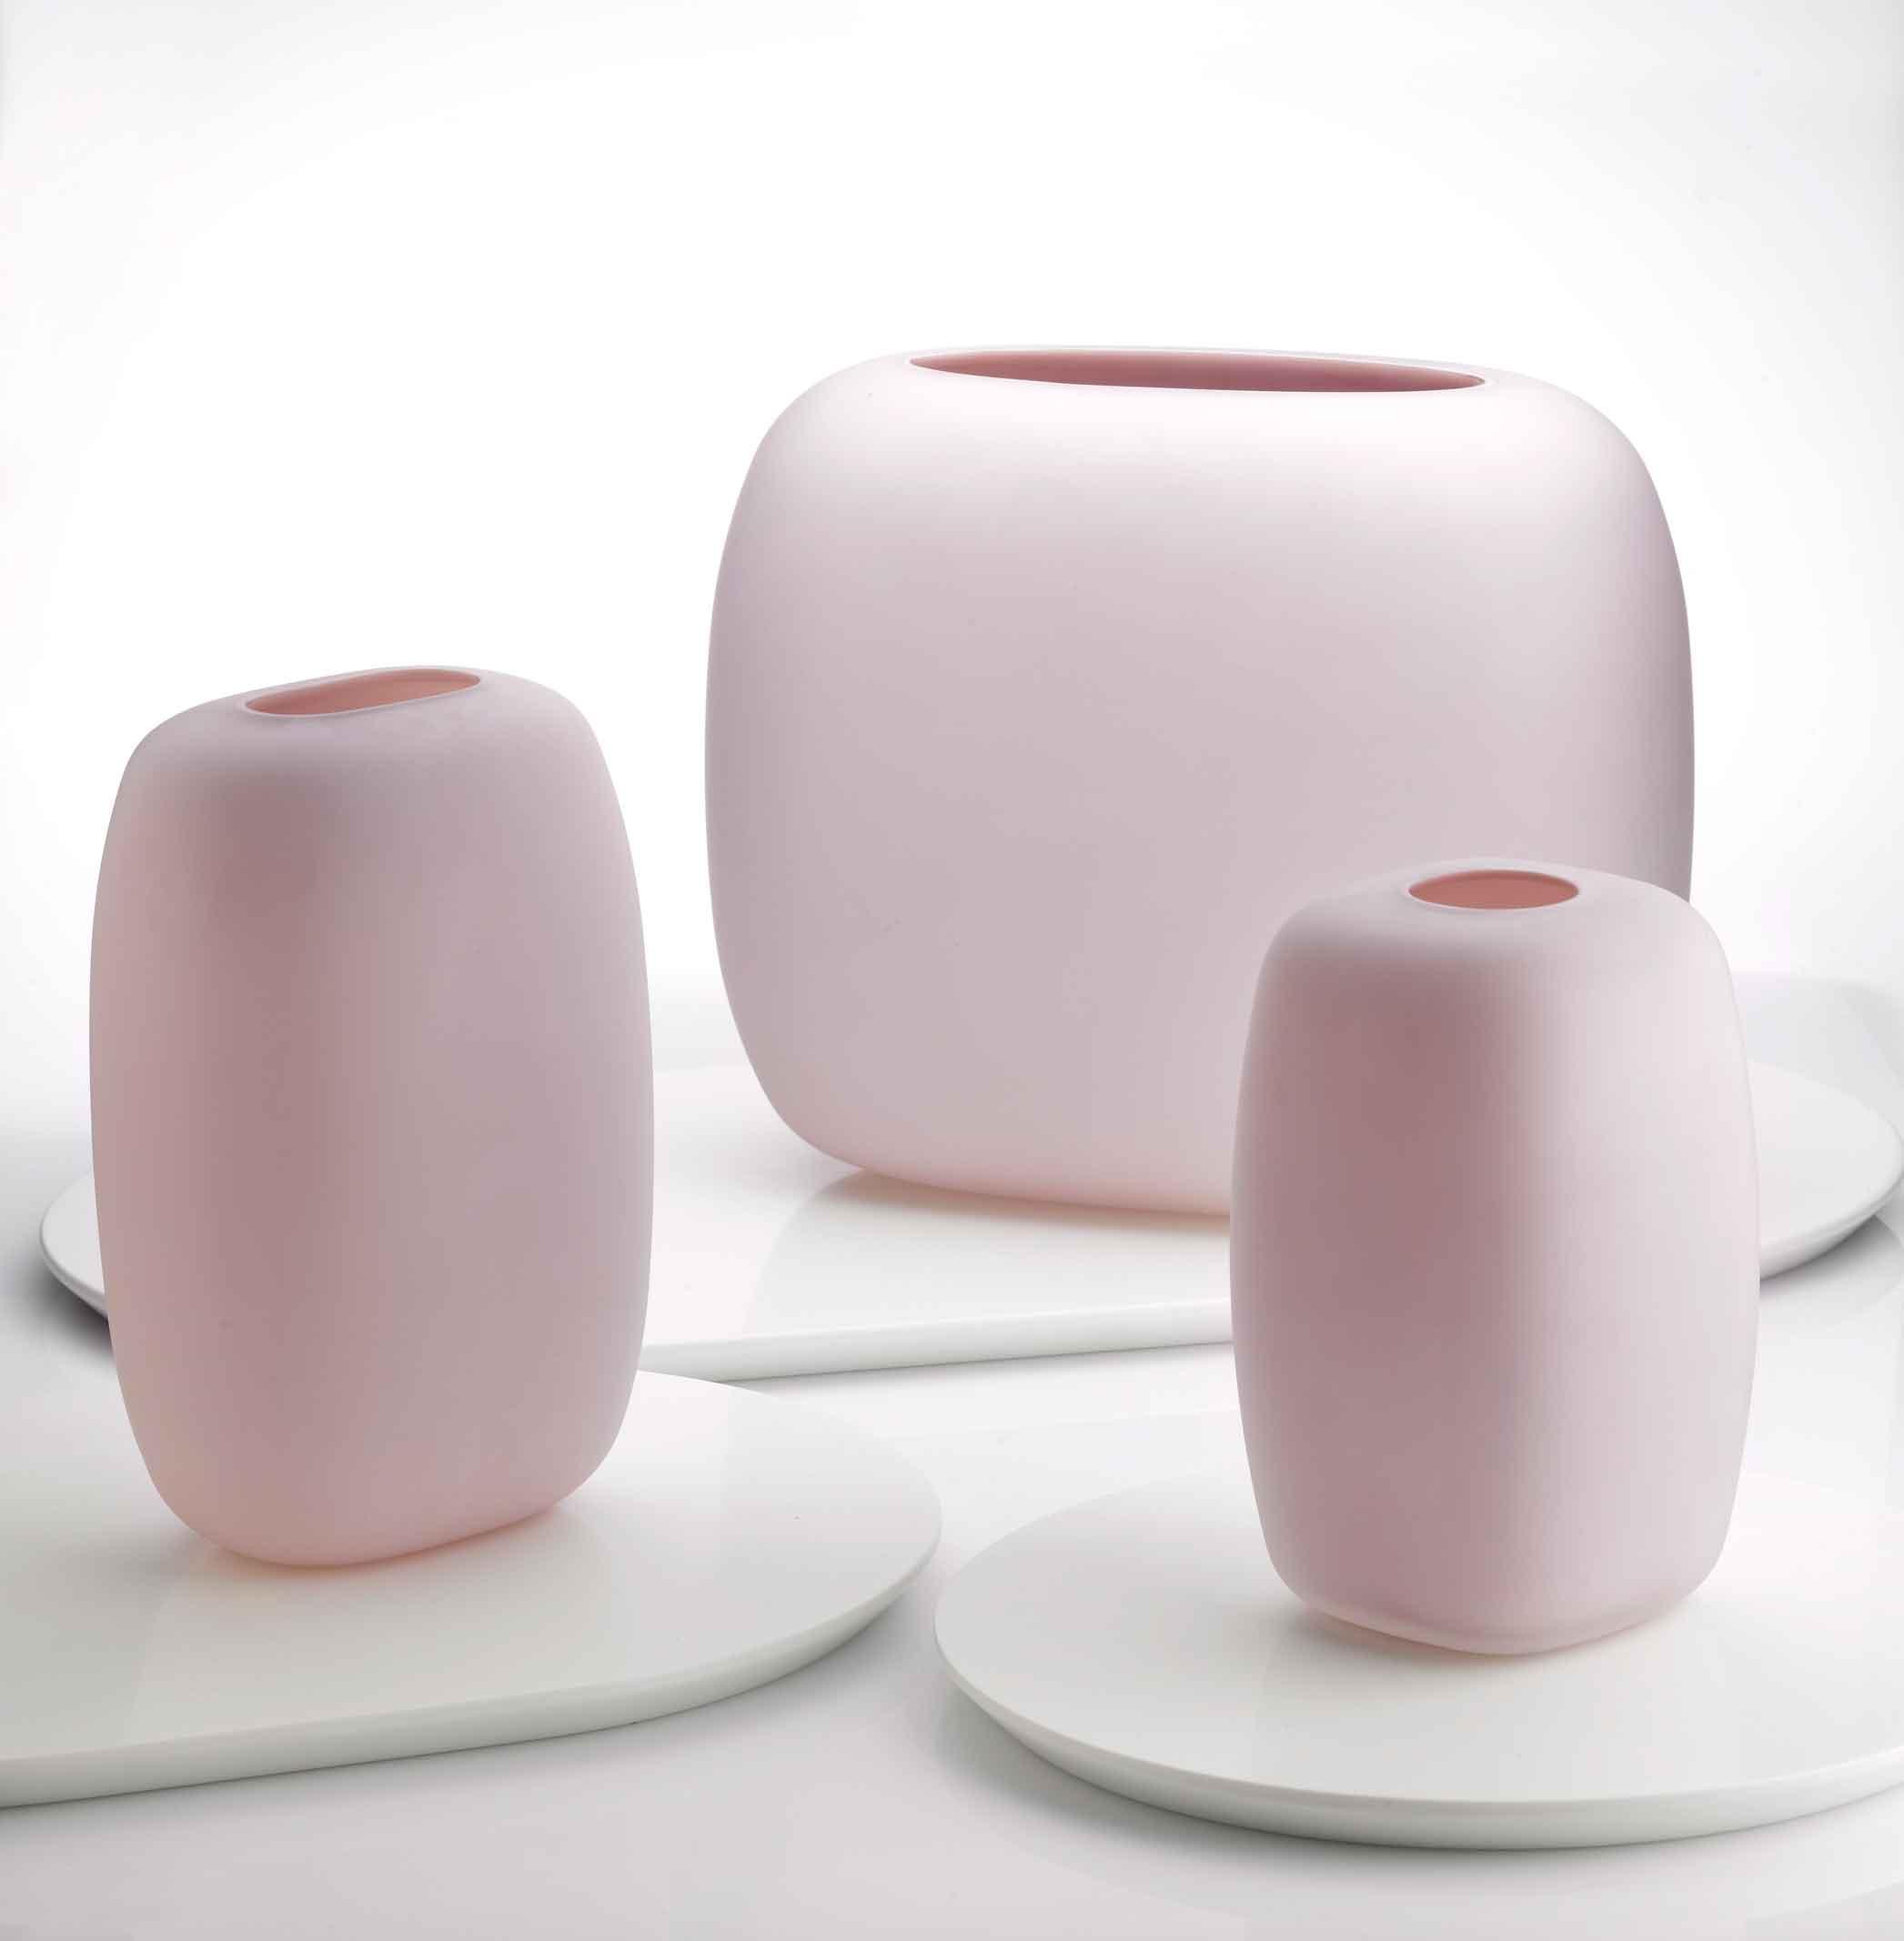 Adrien-Rovero-Studio-sweets-Glass-is-Tomorrow-meets-Nude-4.jpg